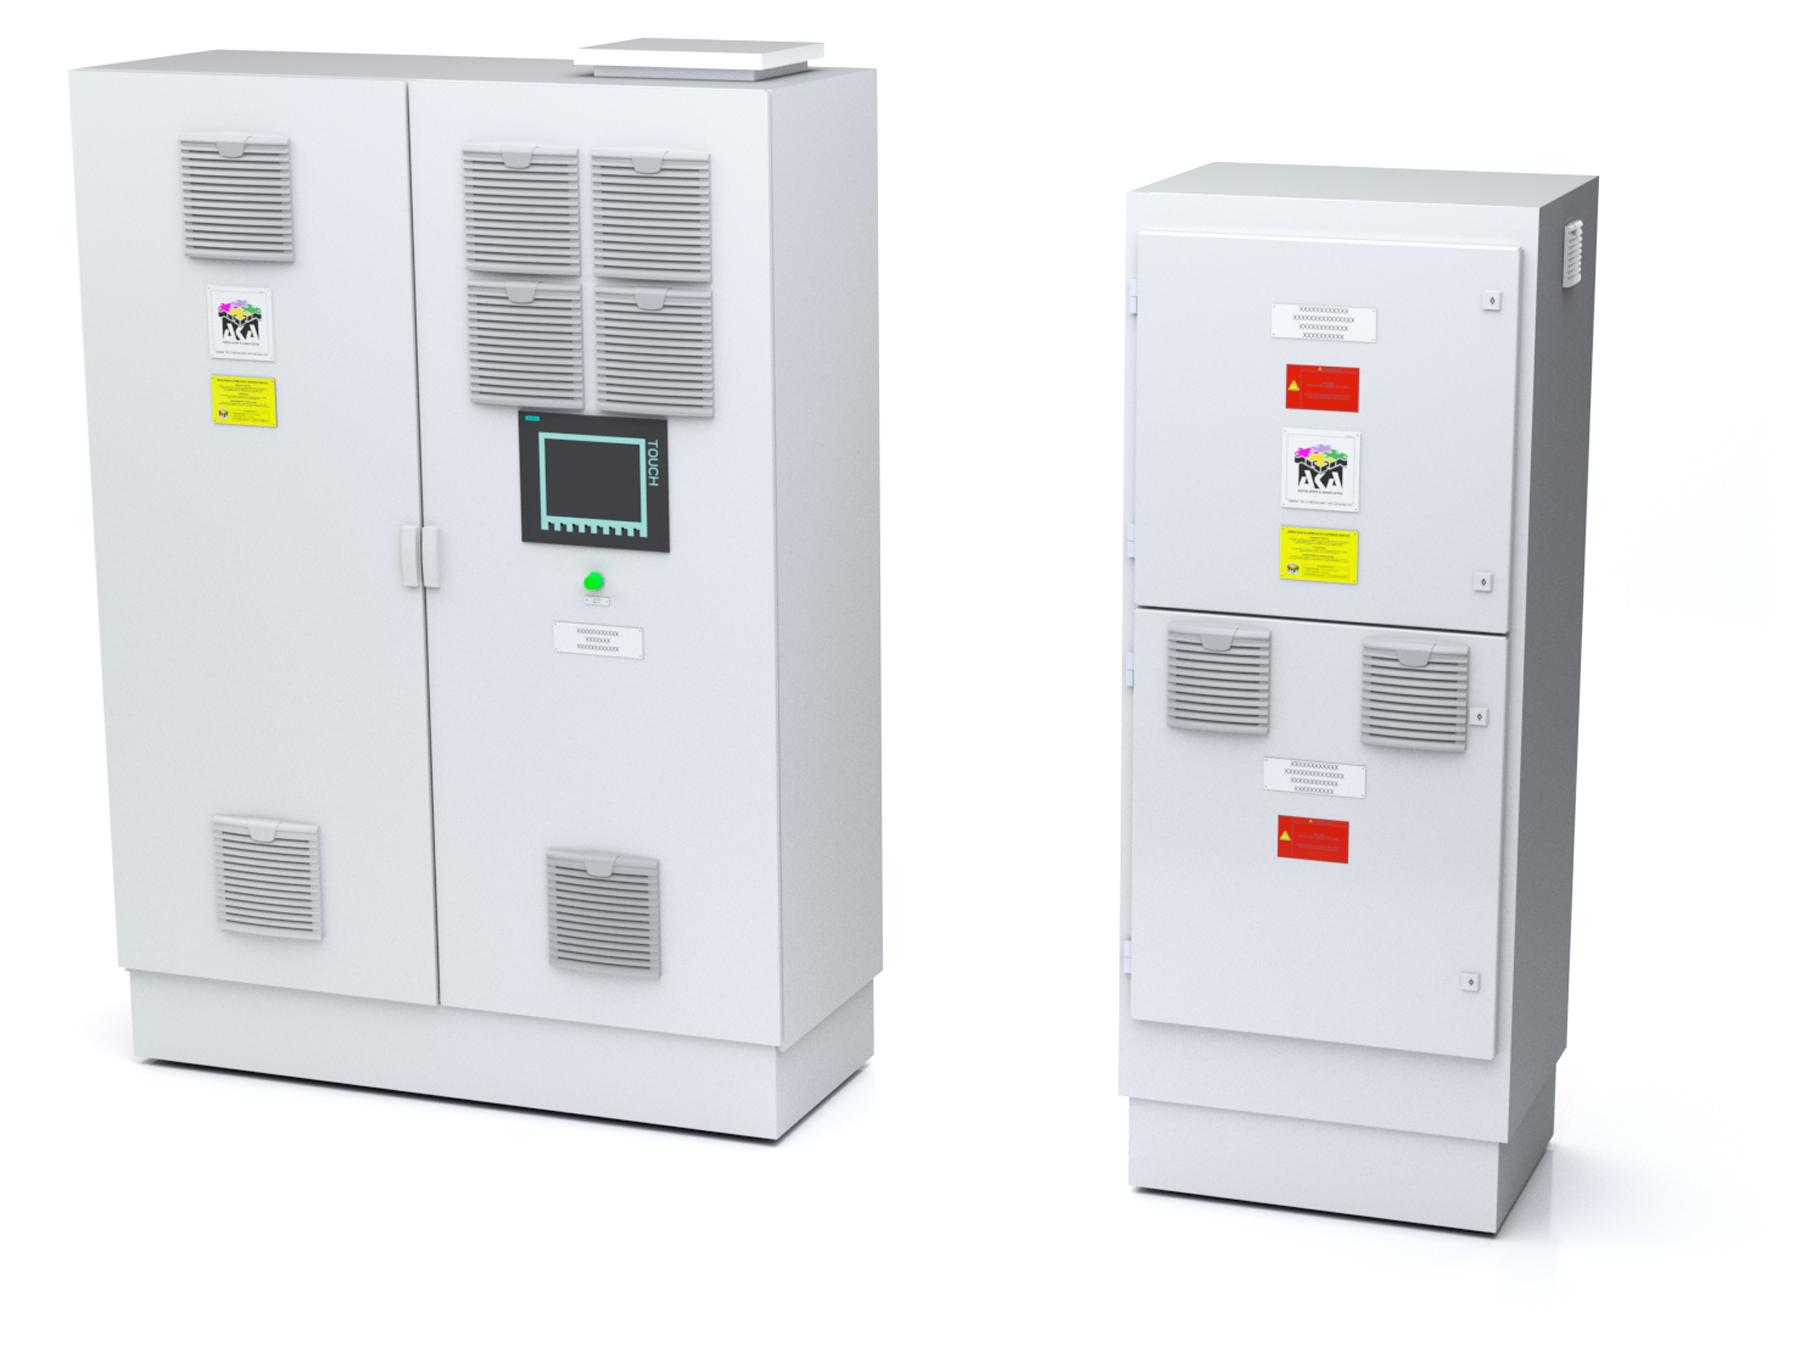 Uninterruptible Power Supply (UPS) - Aspin Kemp & Associates